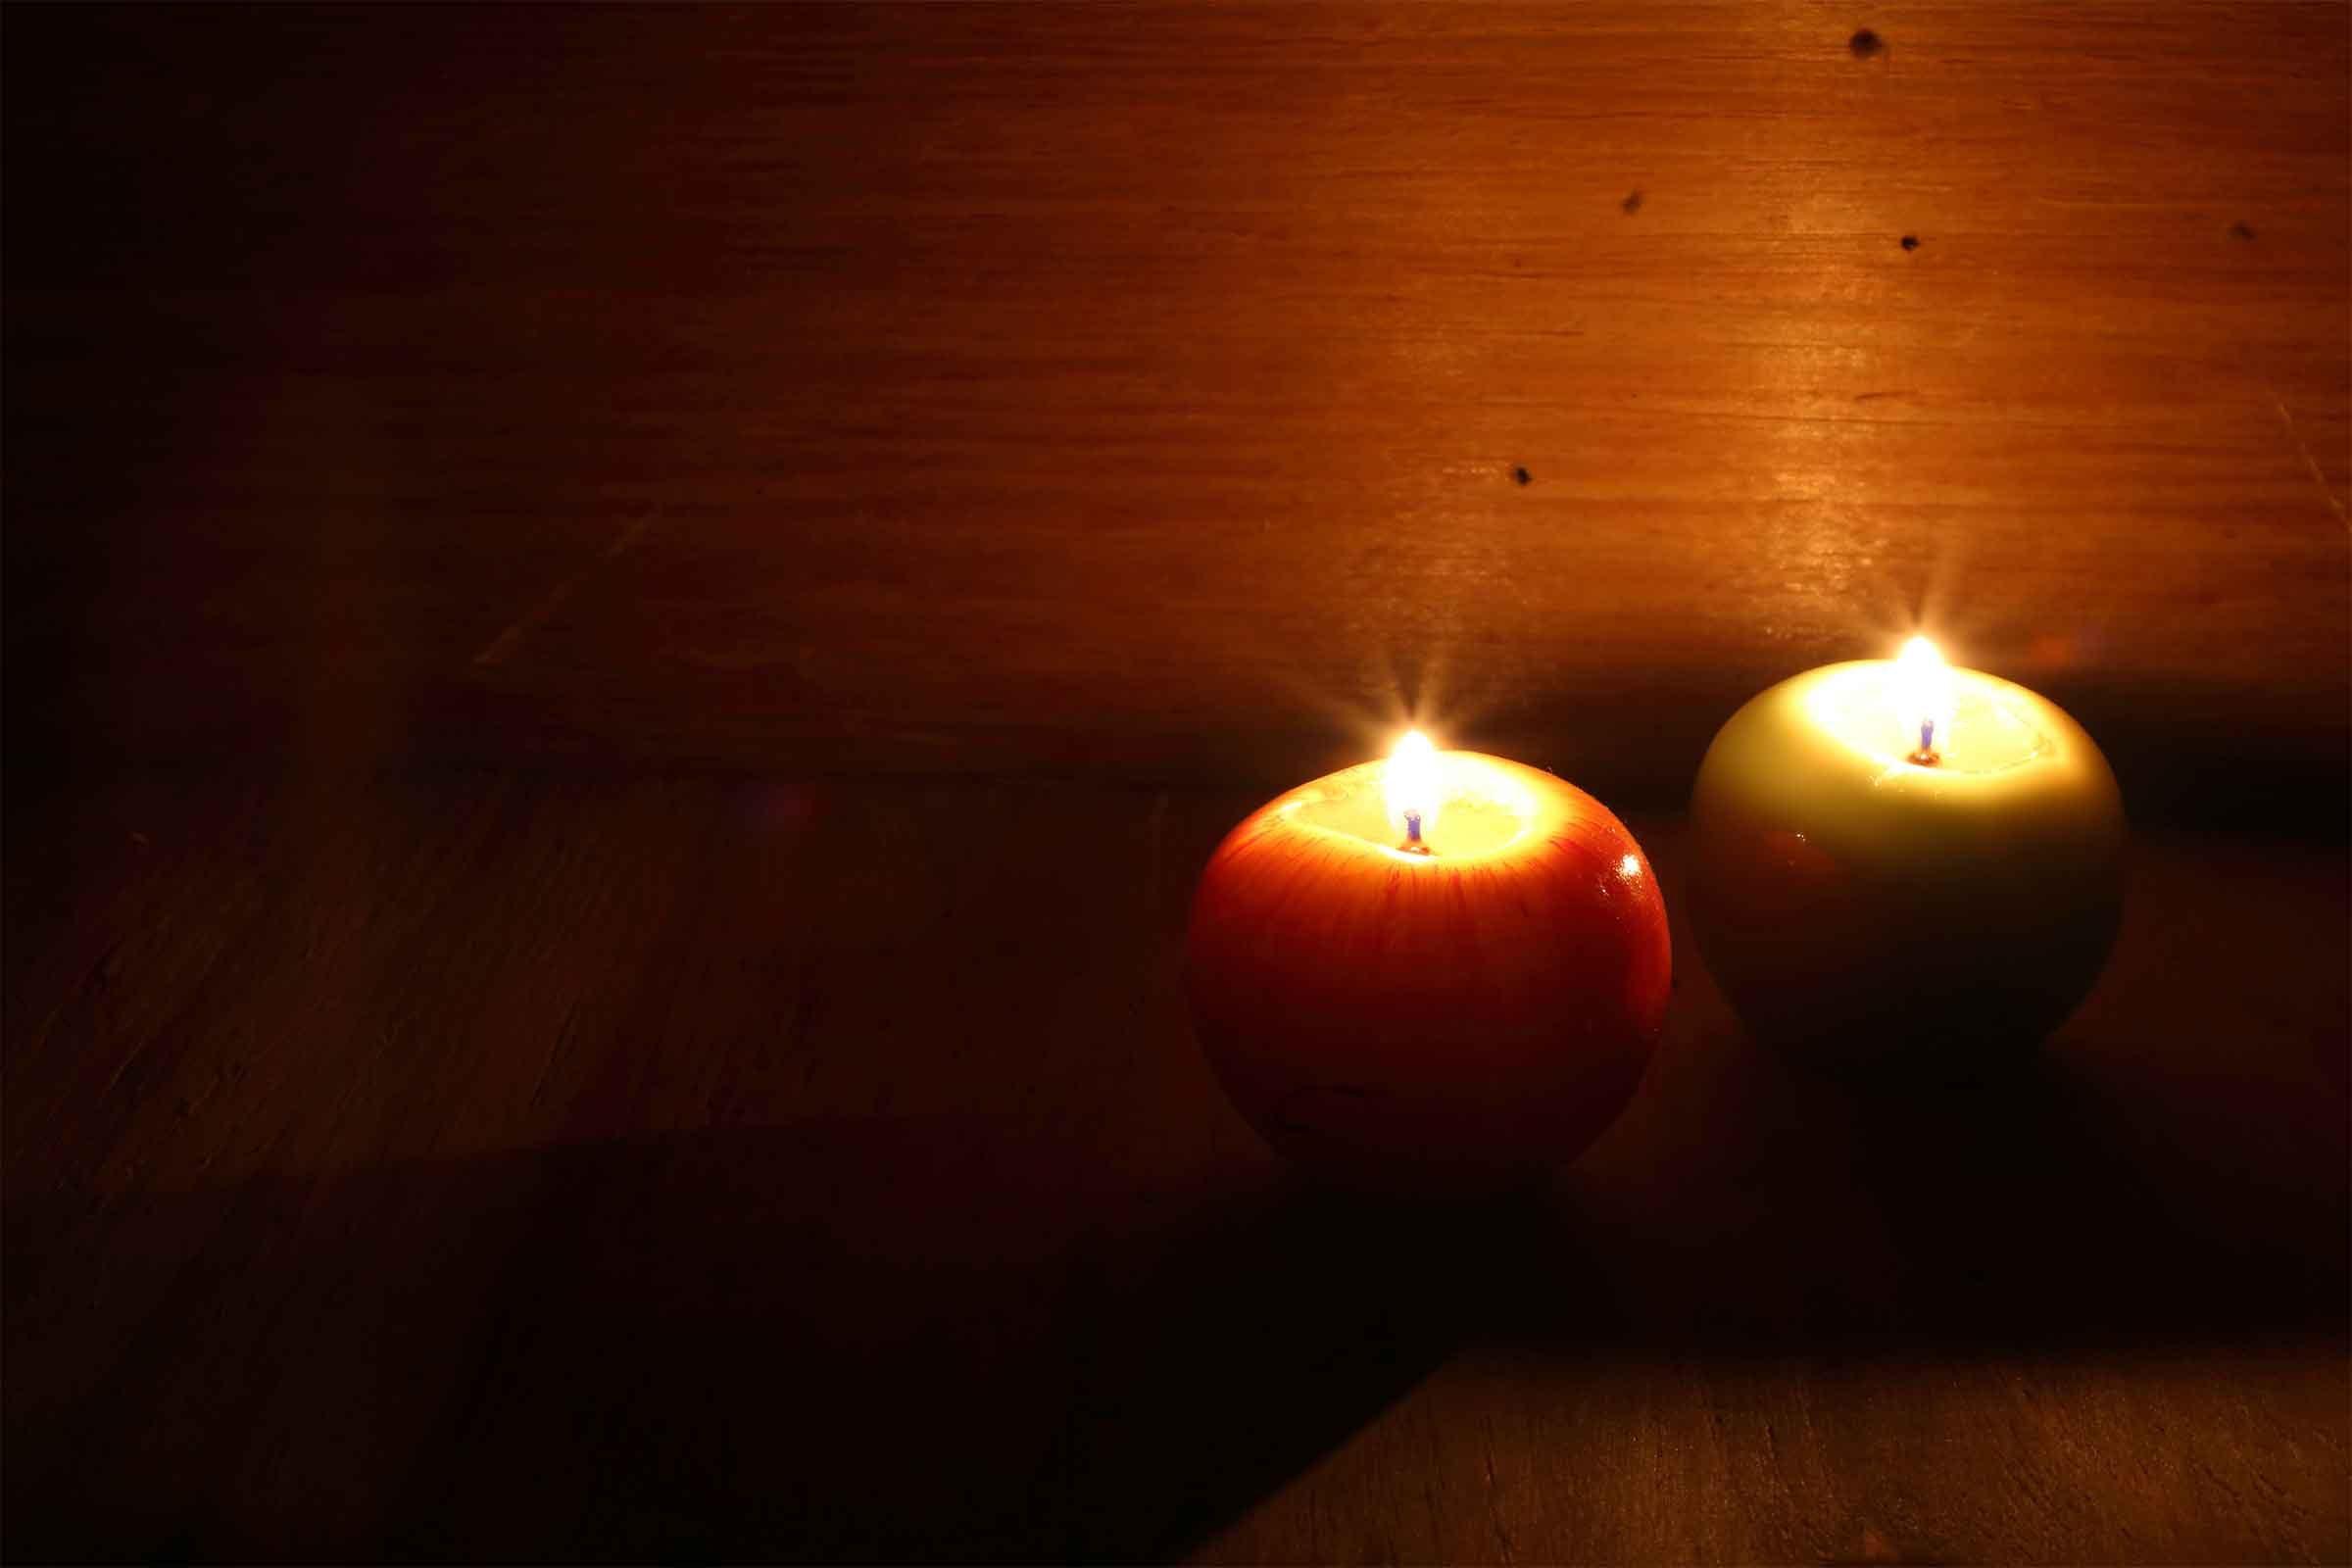 Make a cozy candlestick